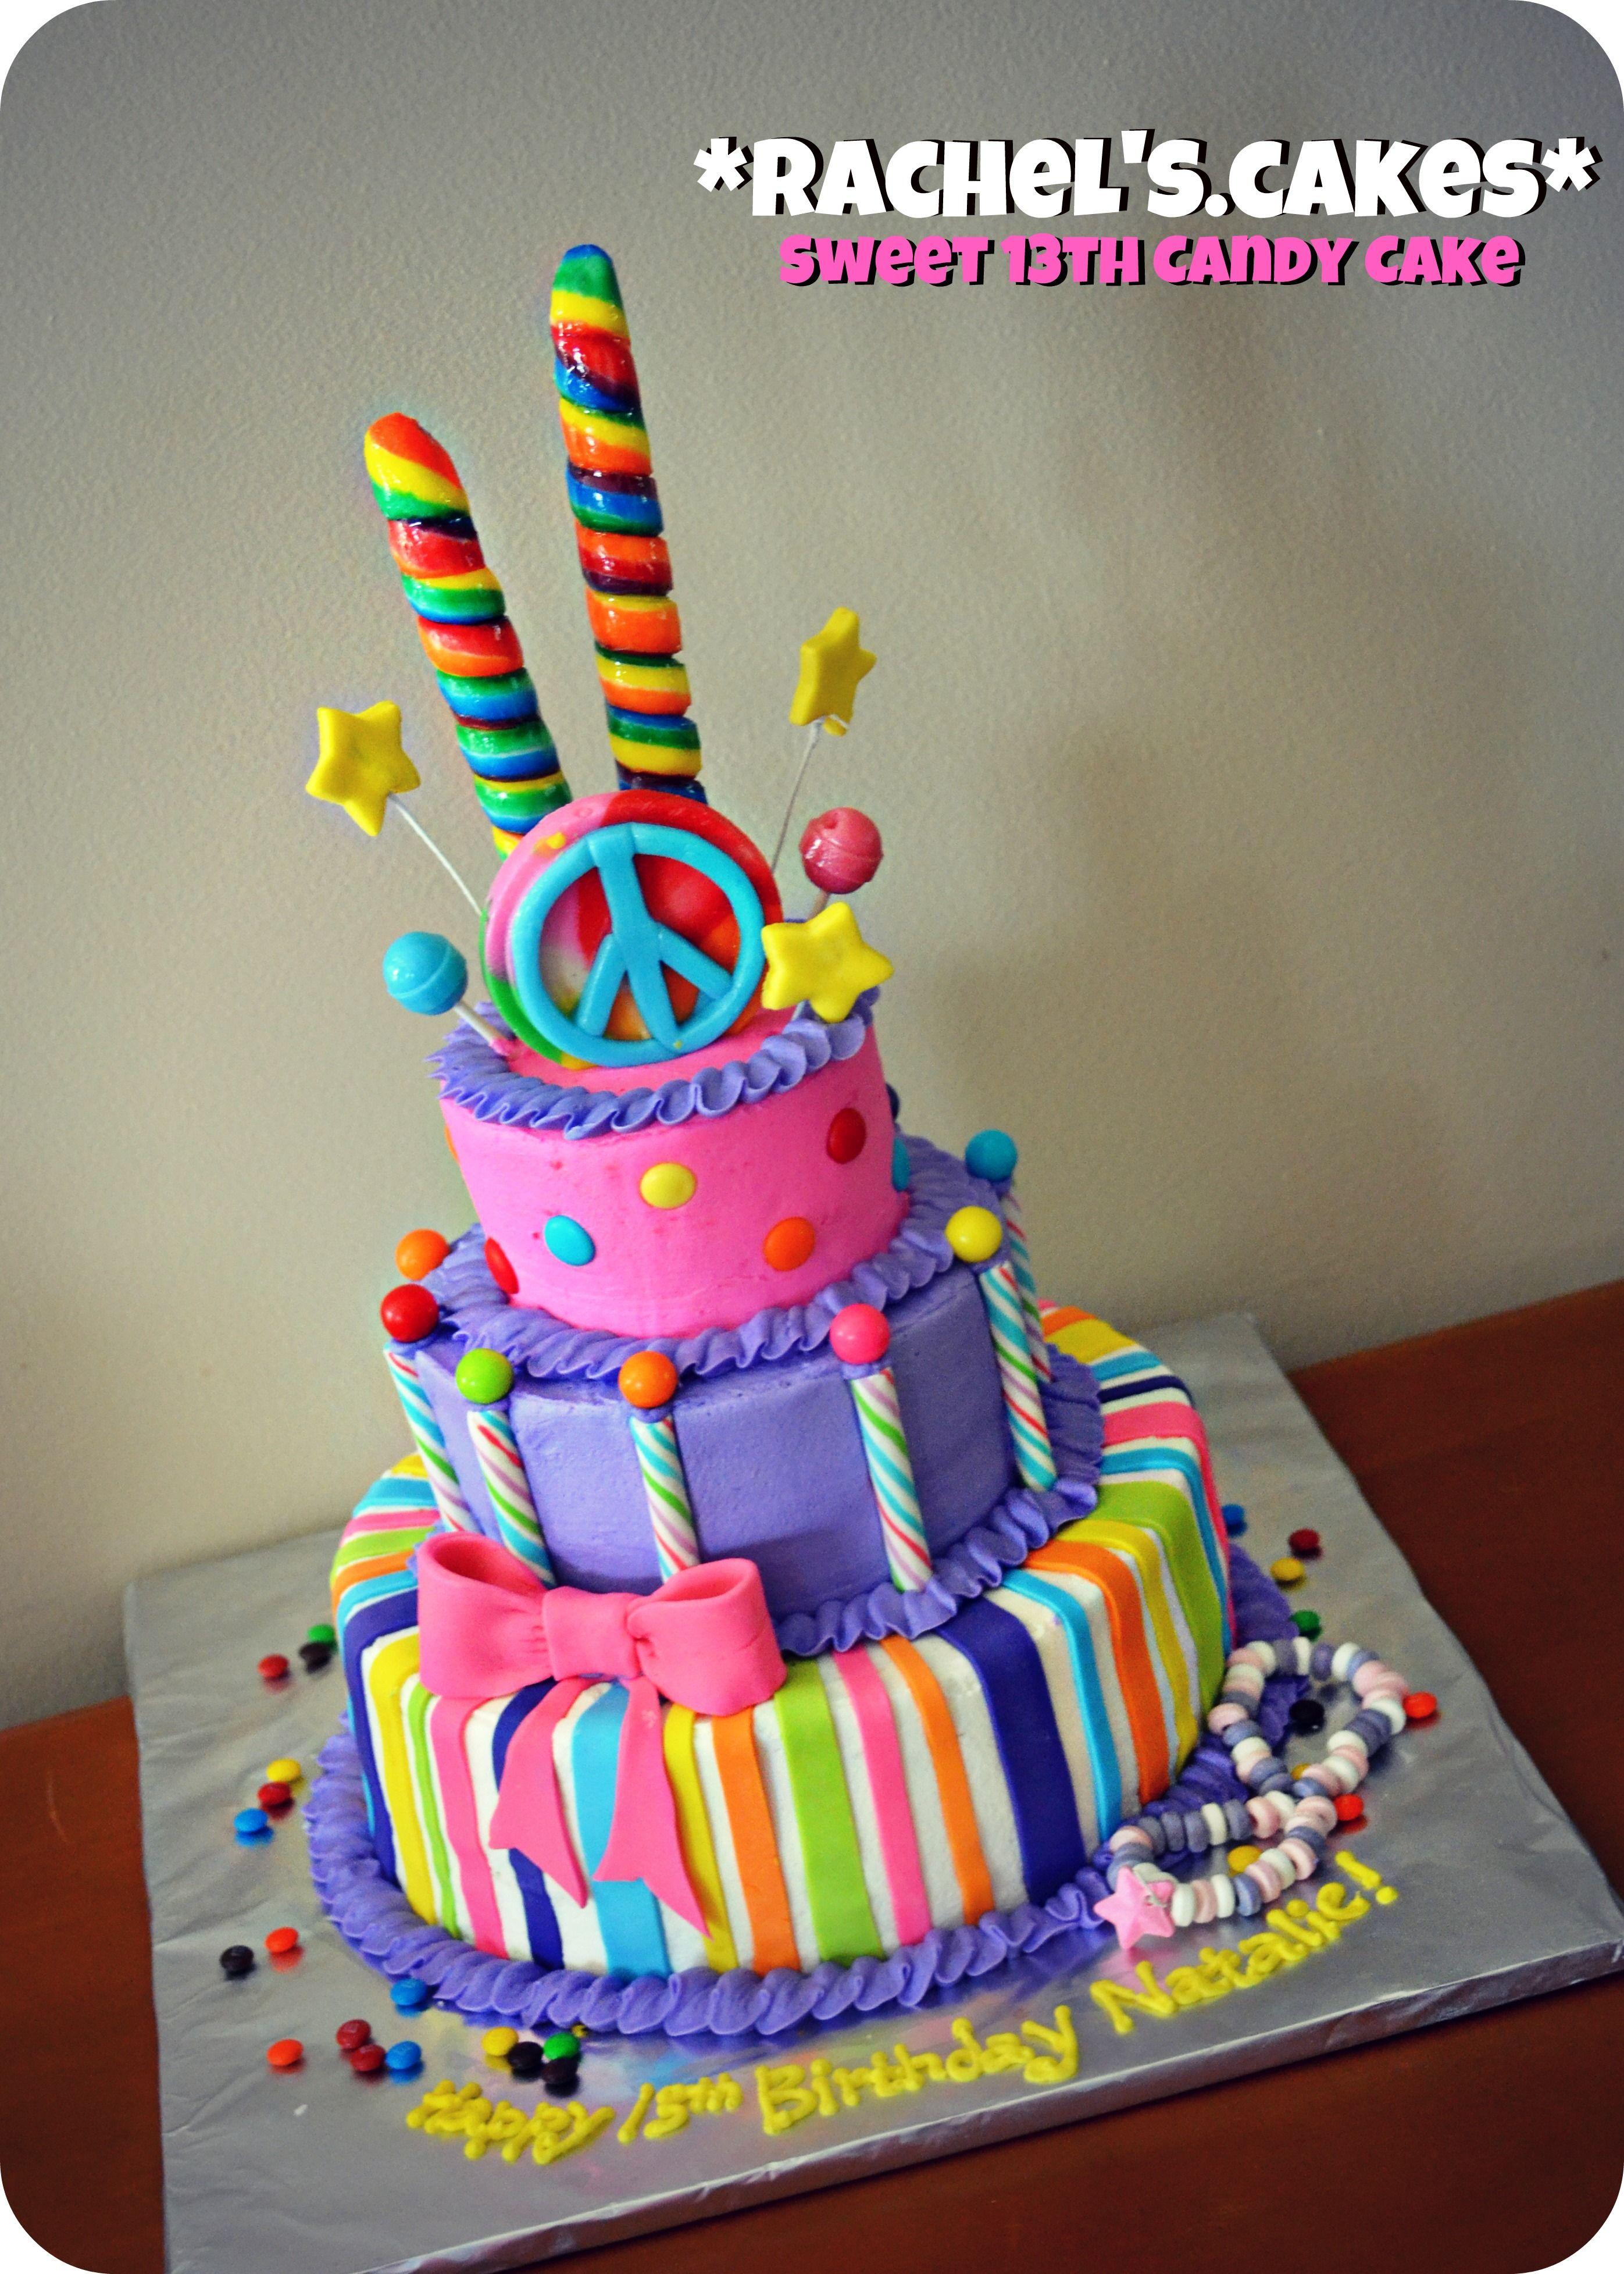 sweet 13th birthday cake my own cakes birthday cake